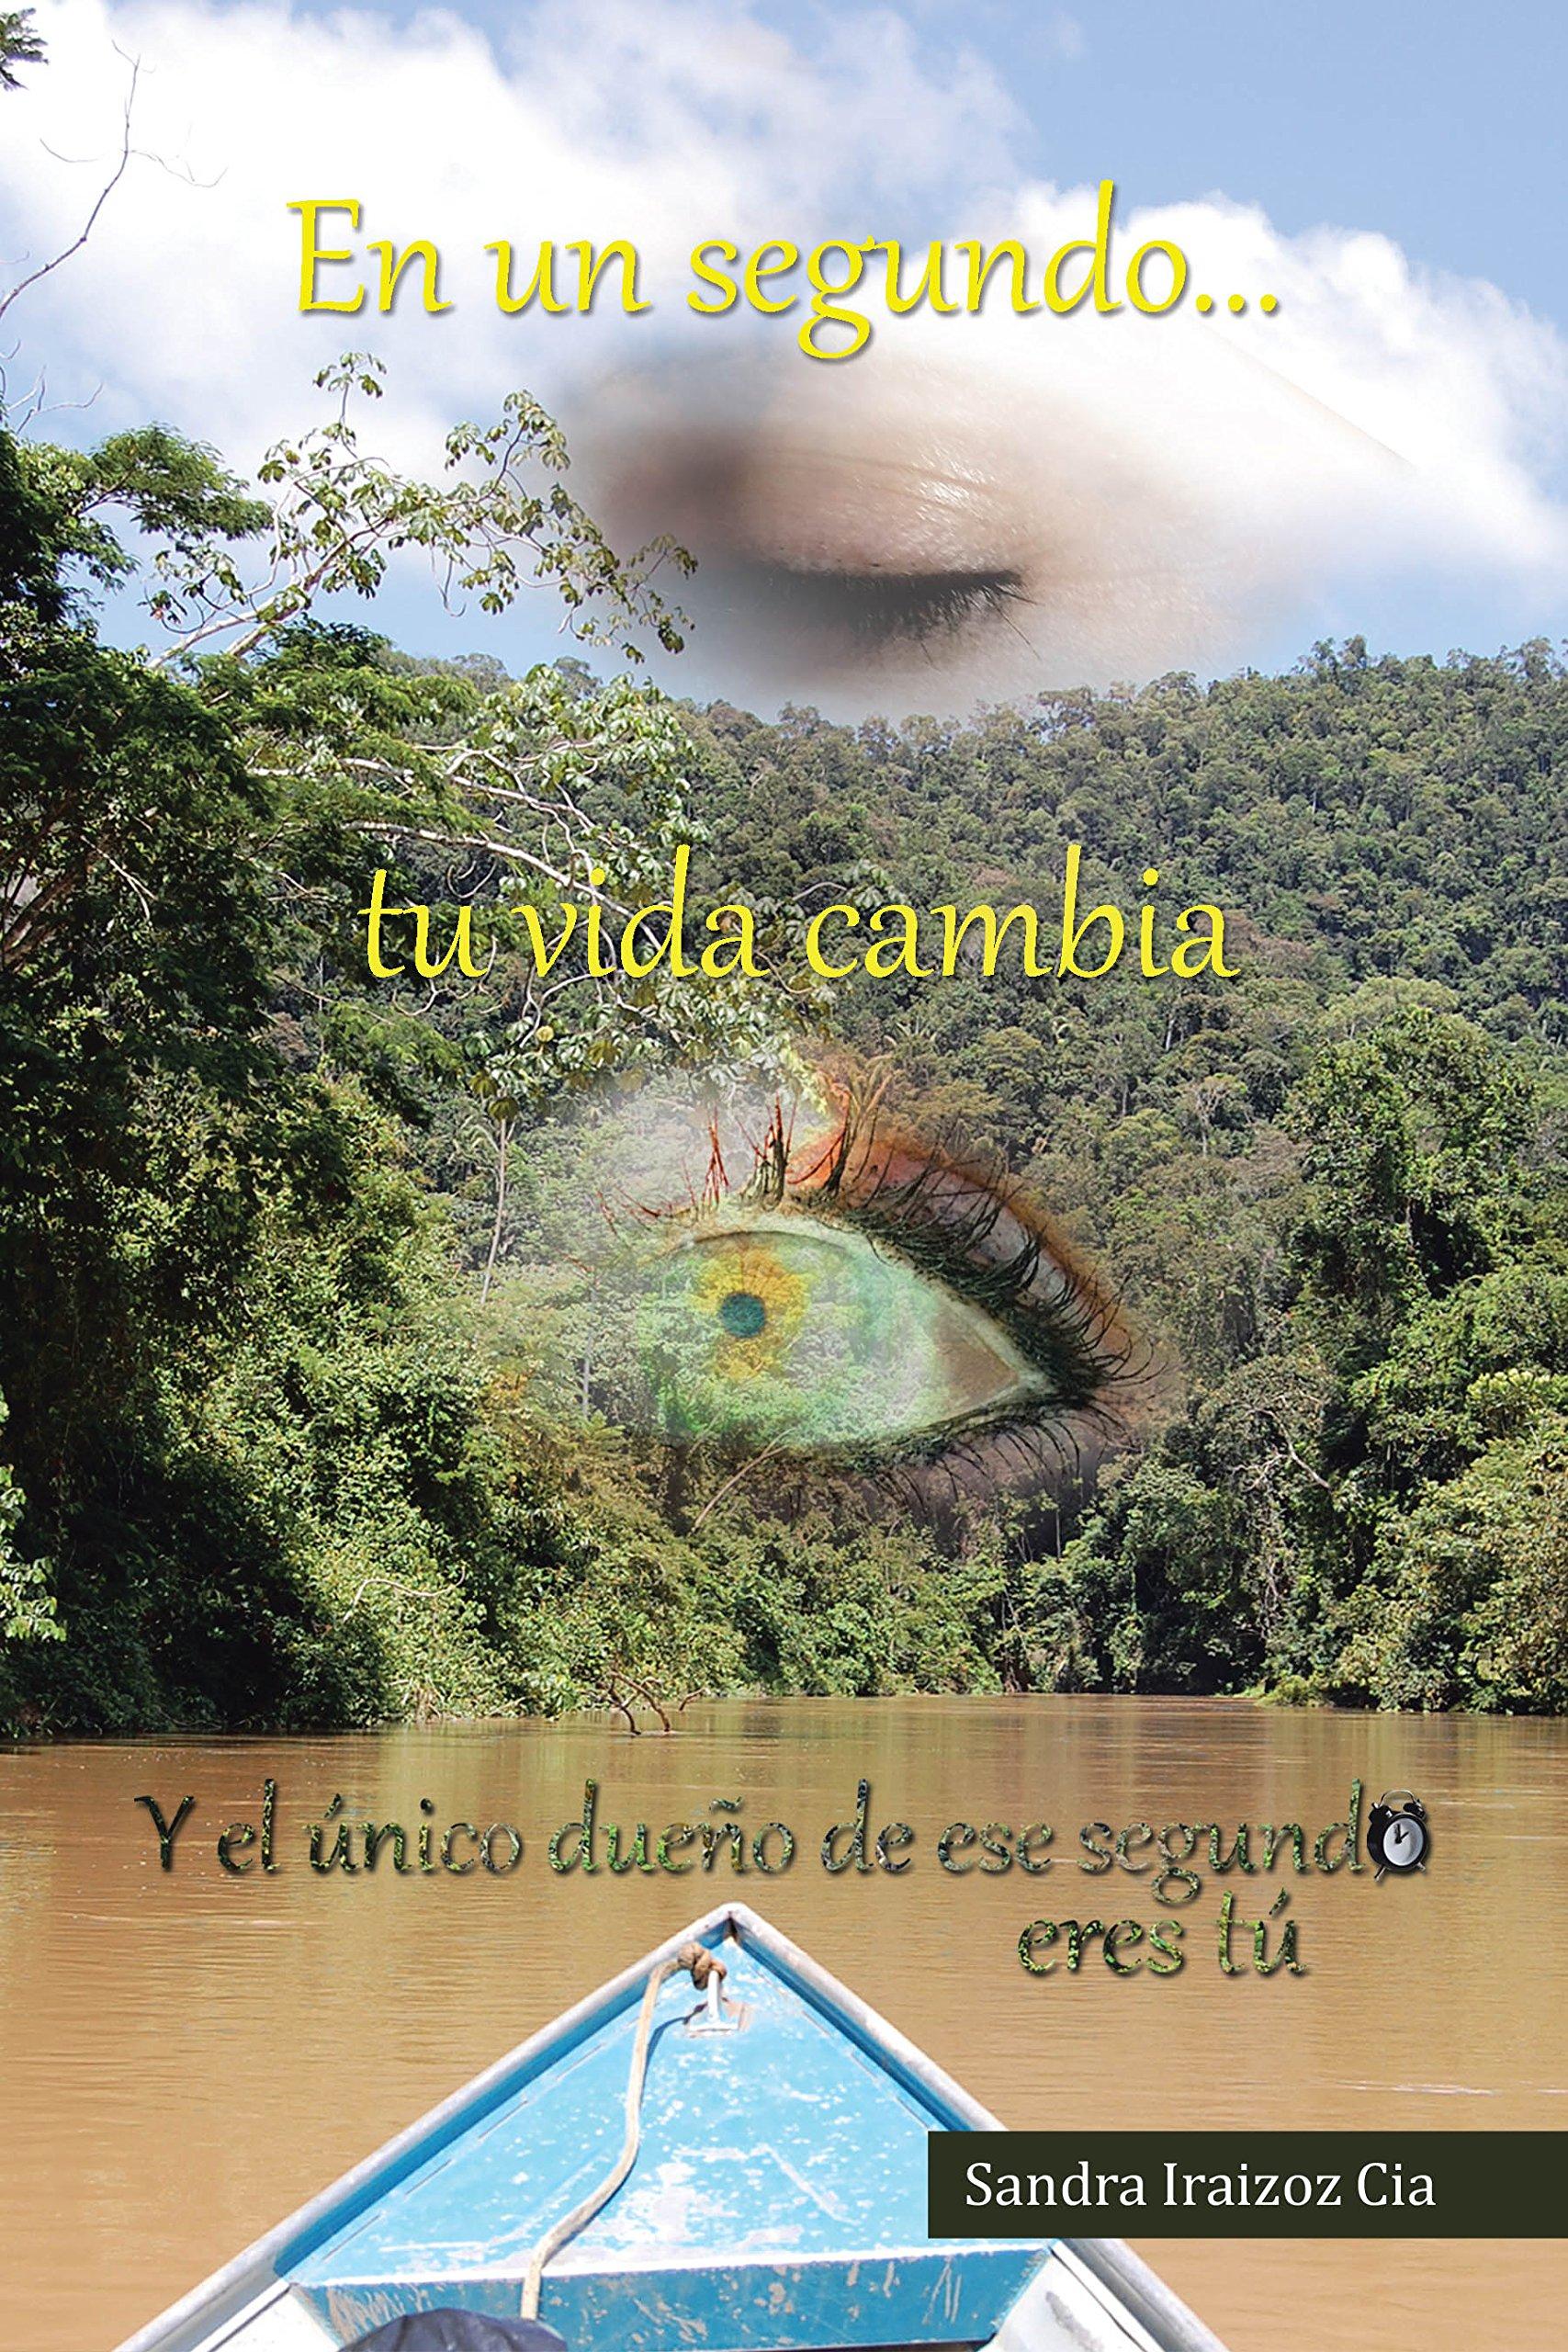 En un segundo tu vida cambia (Spanish Edition): Sandra Iraizoz Cia: 9788491121510: Amazon.com: Books